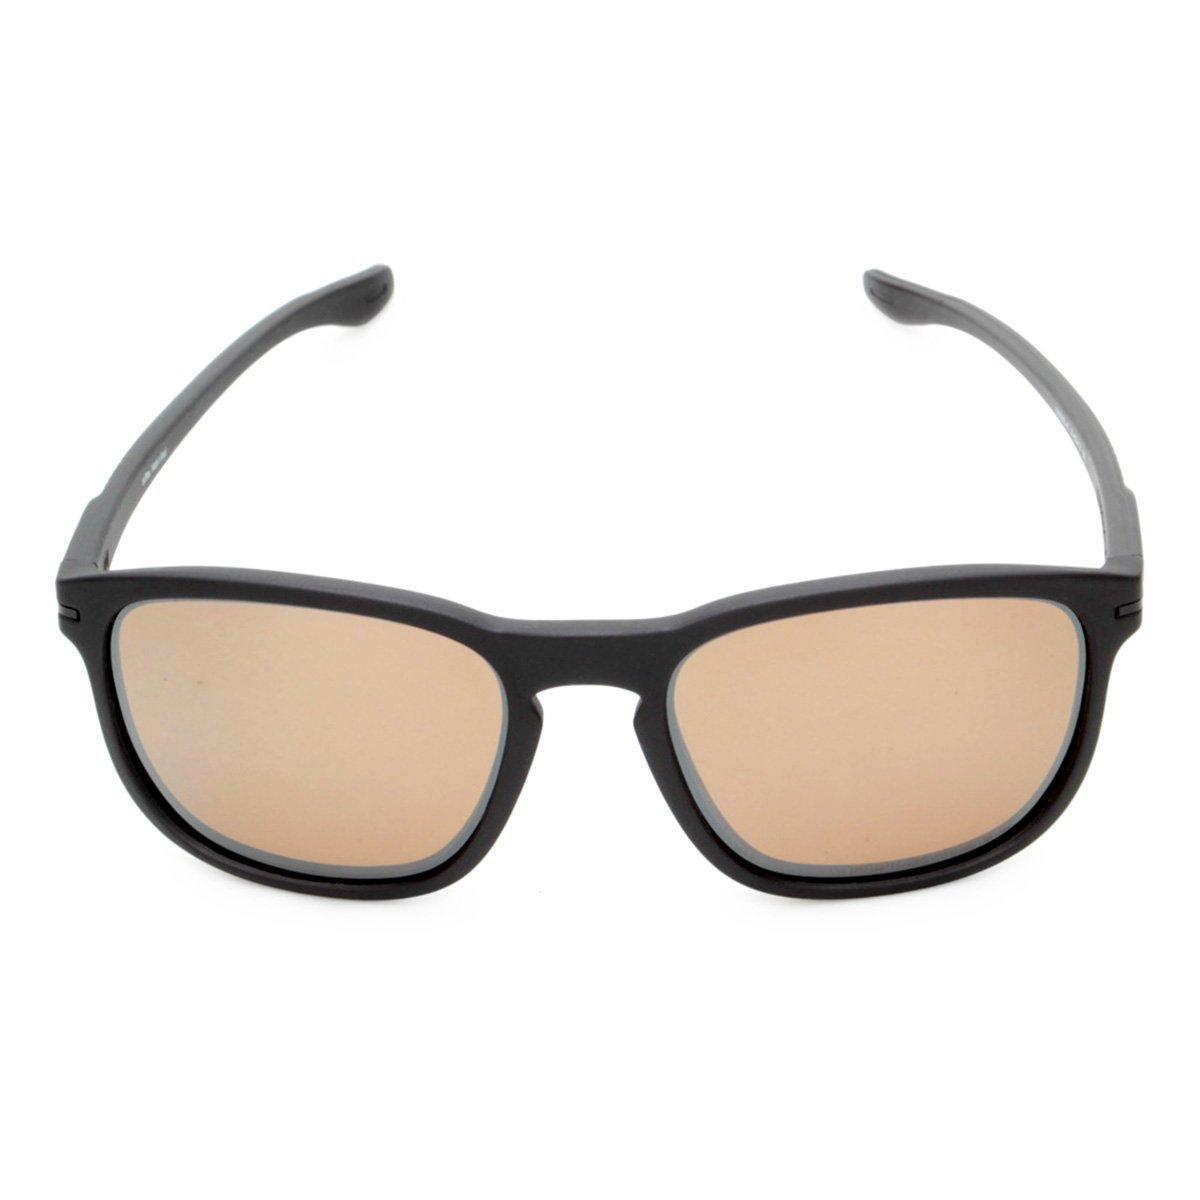 fa1af8f002201 Óculos Oakley Enduro Polarizado  Óculos Oakley Enduro Polarizado ...